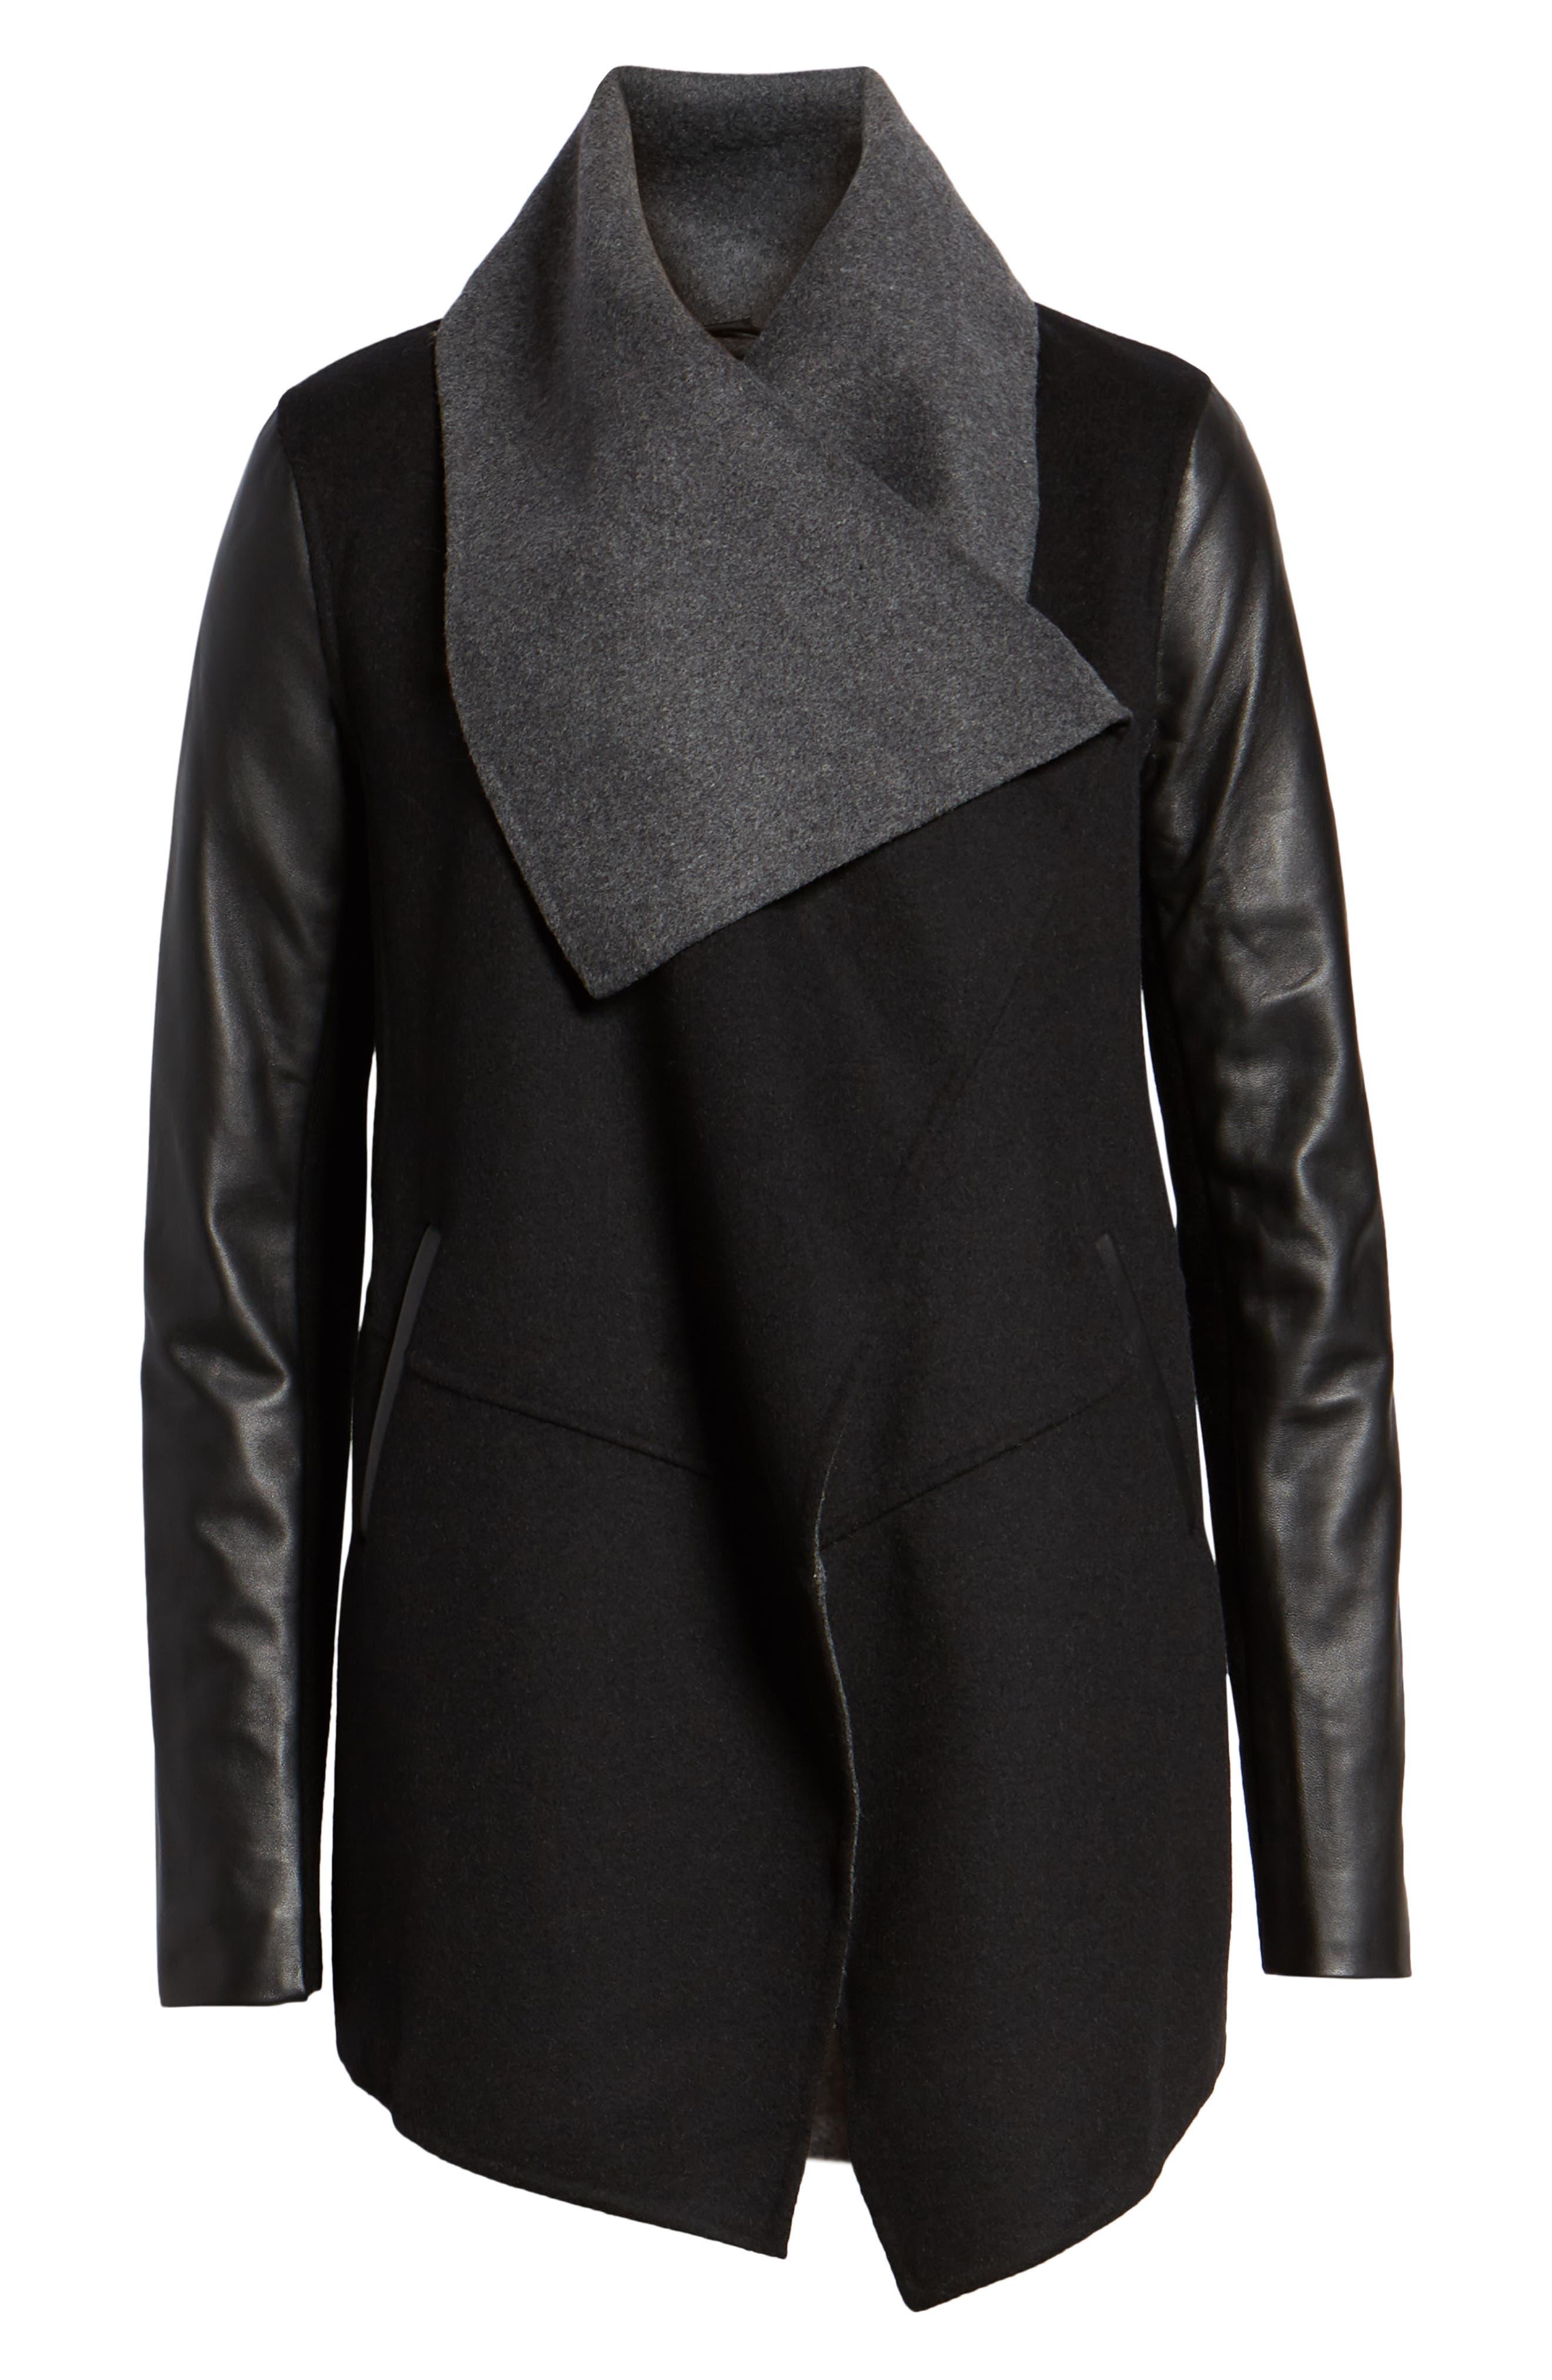 Vane Asymmetrical Leather Sleeve Coat,                             Alternate thumbnail 6, color,                             BLACK/ CHARCOAL